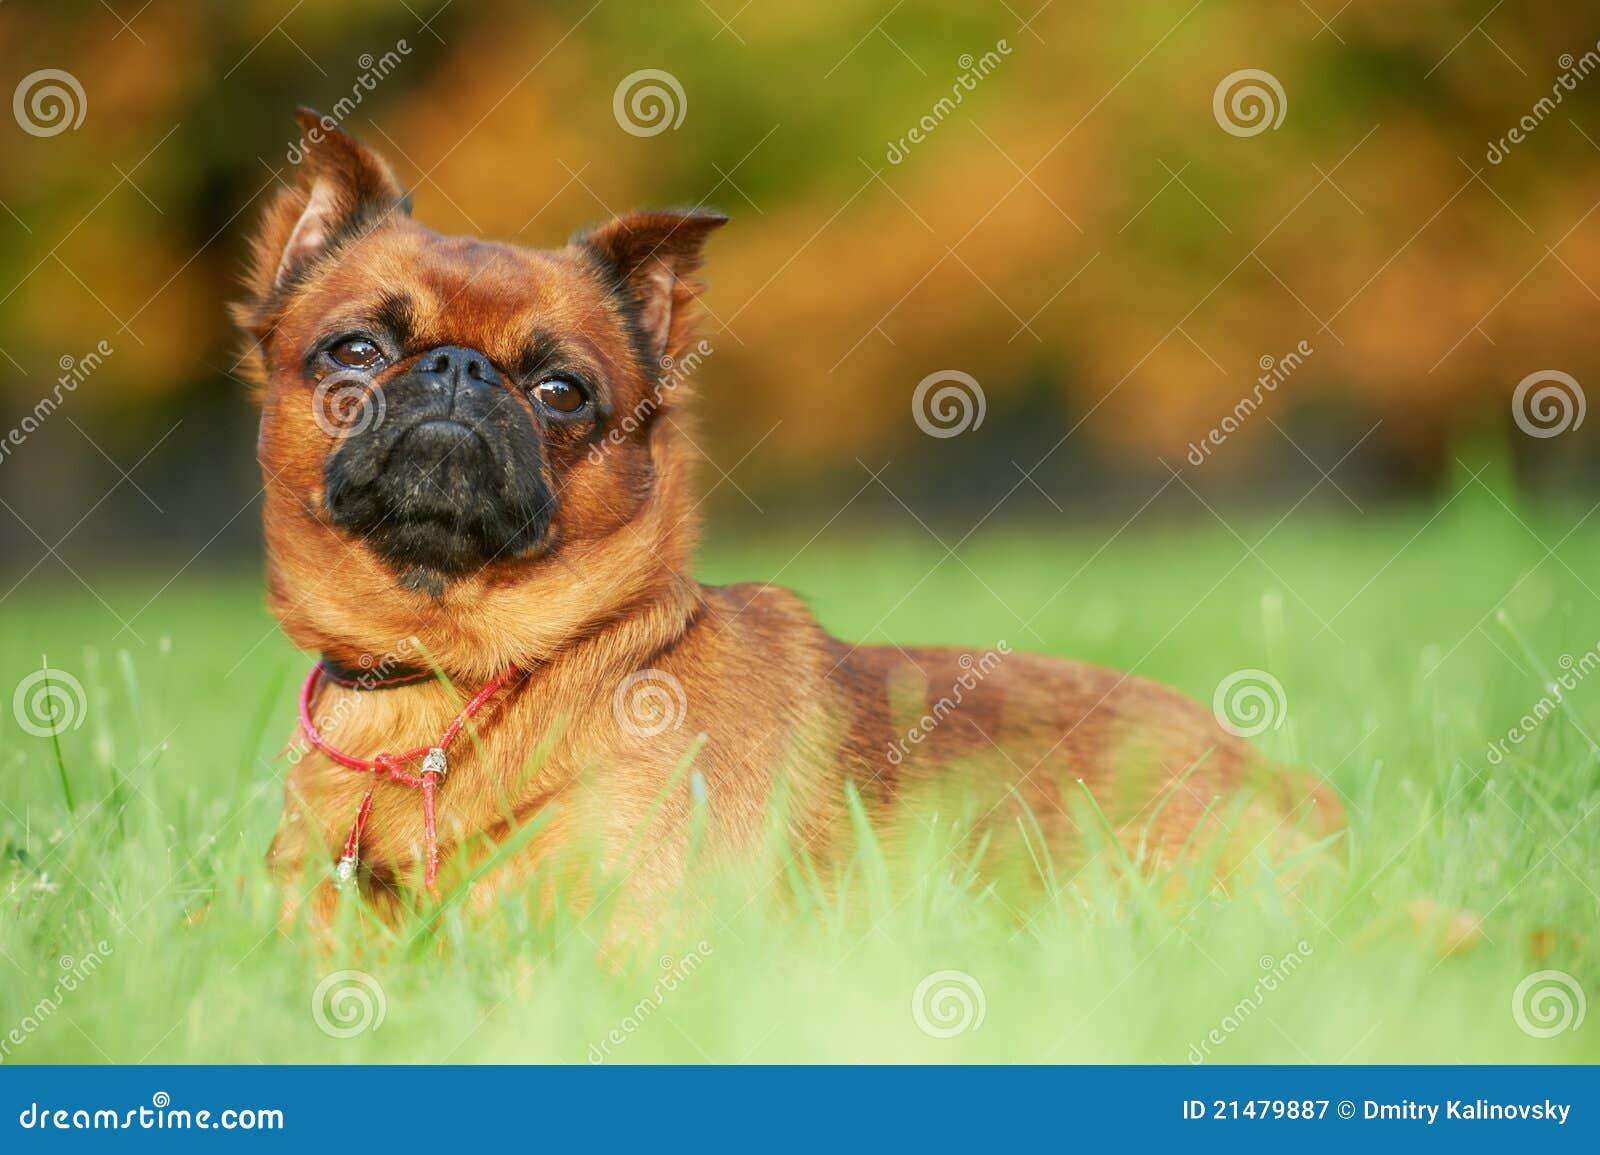 Griffon Brussels petit brabancon dog